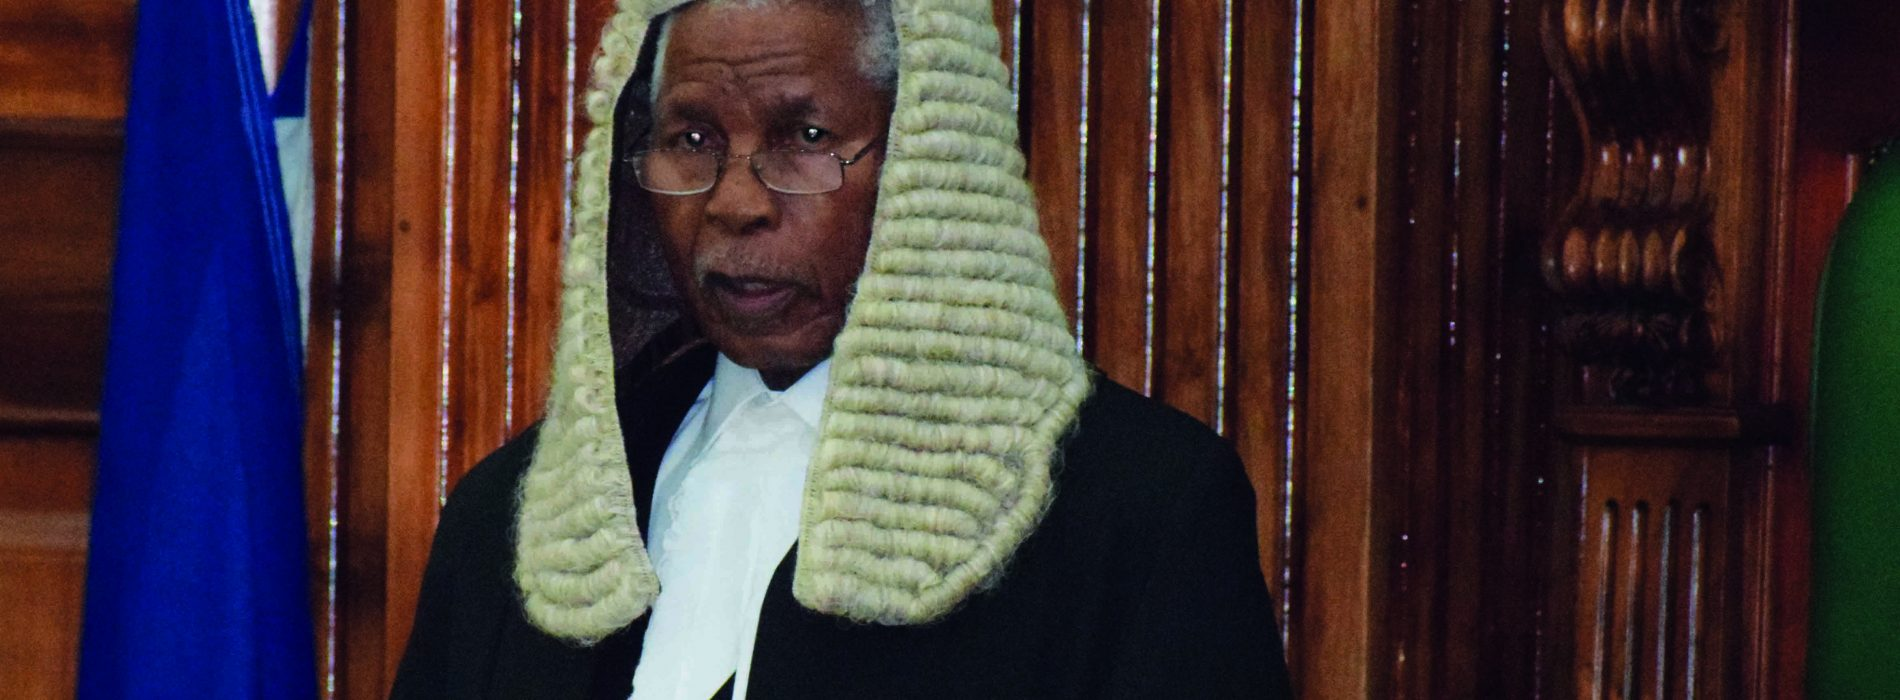 Drama in Parliament